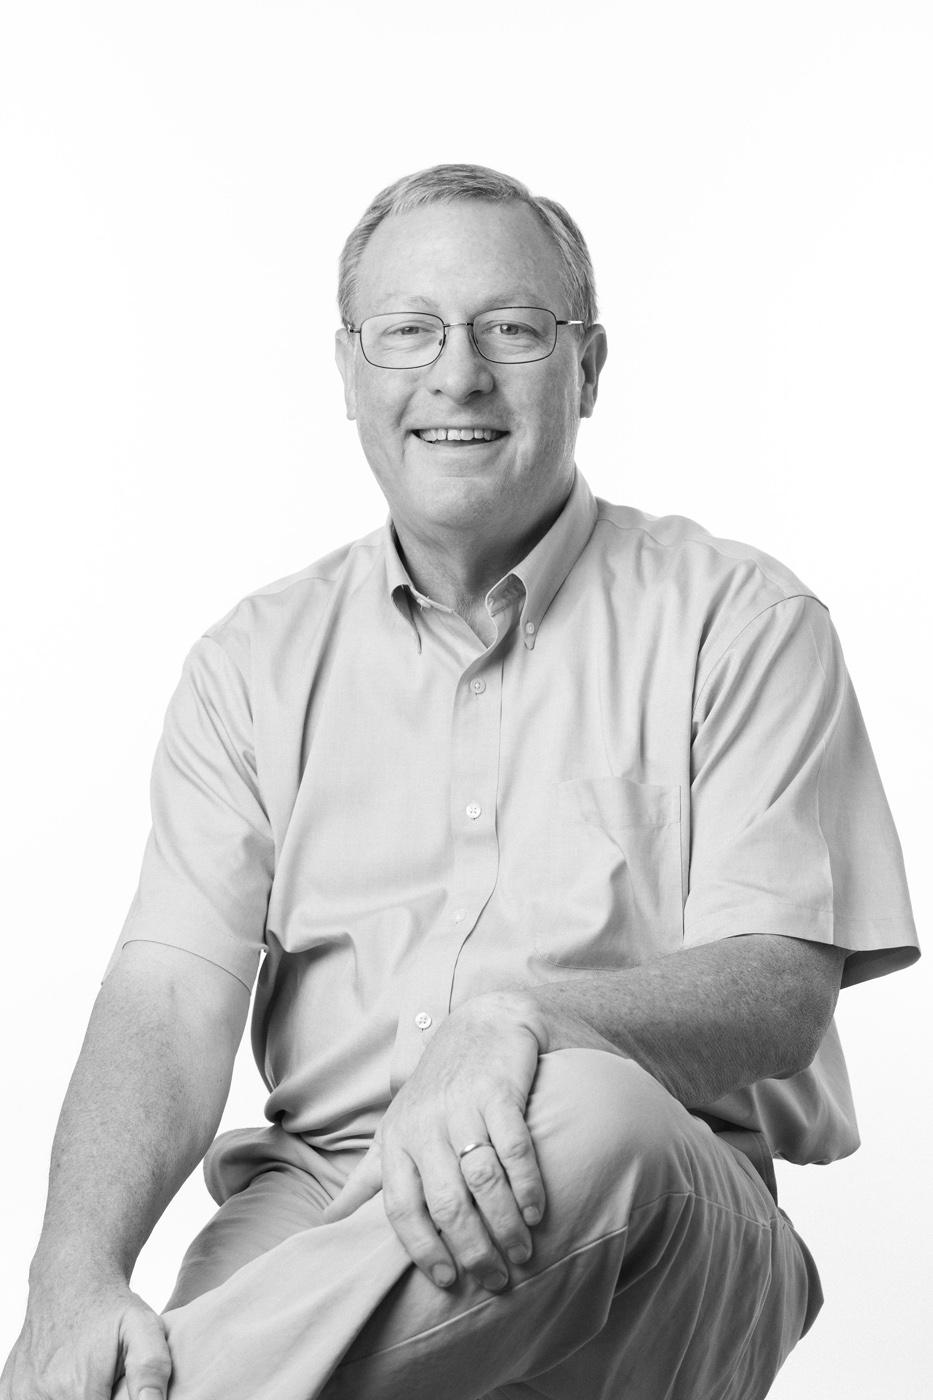 Bob Shoulders headshot